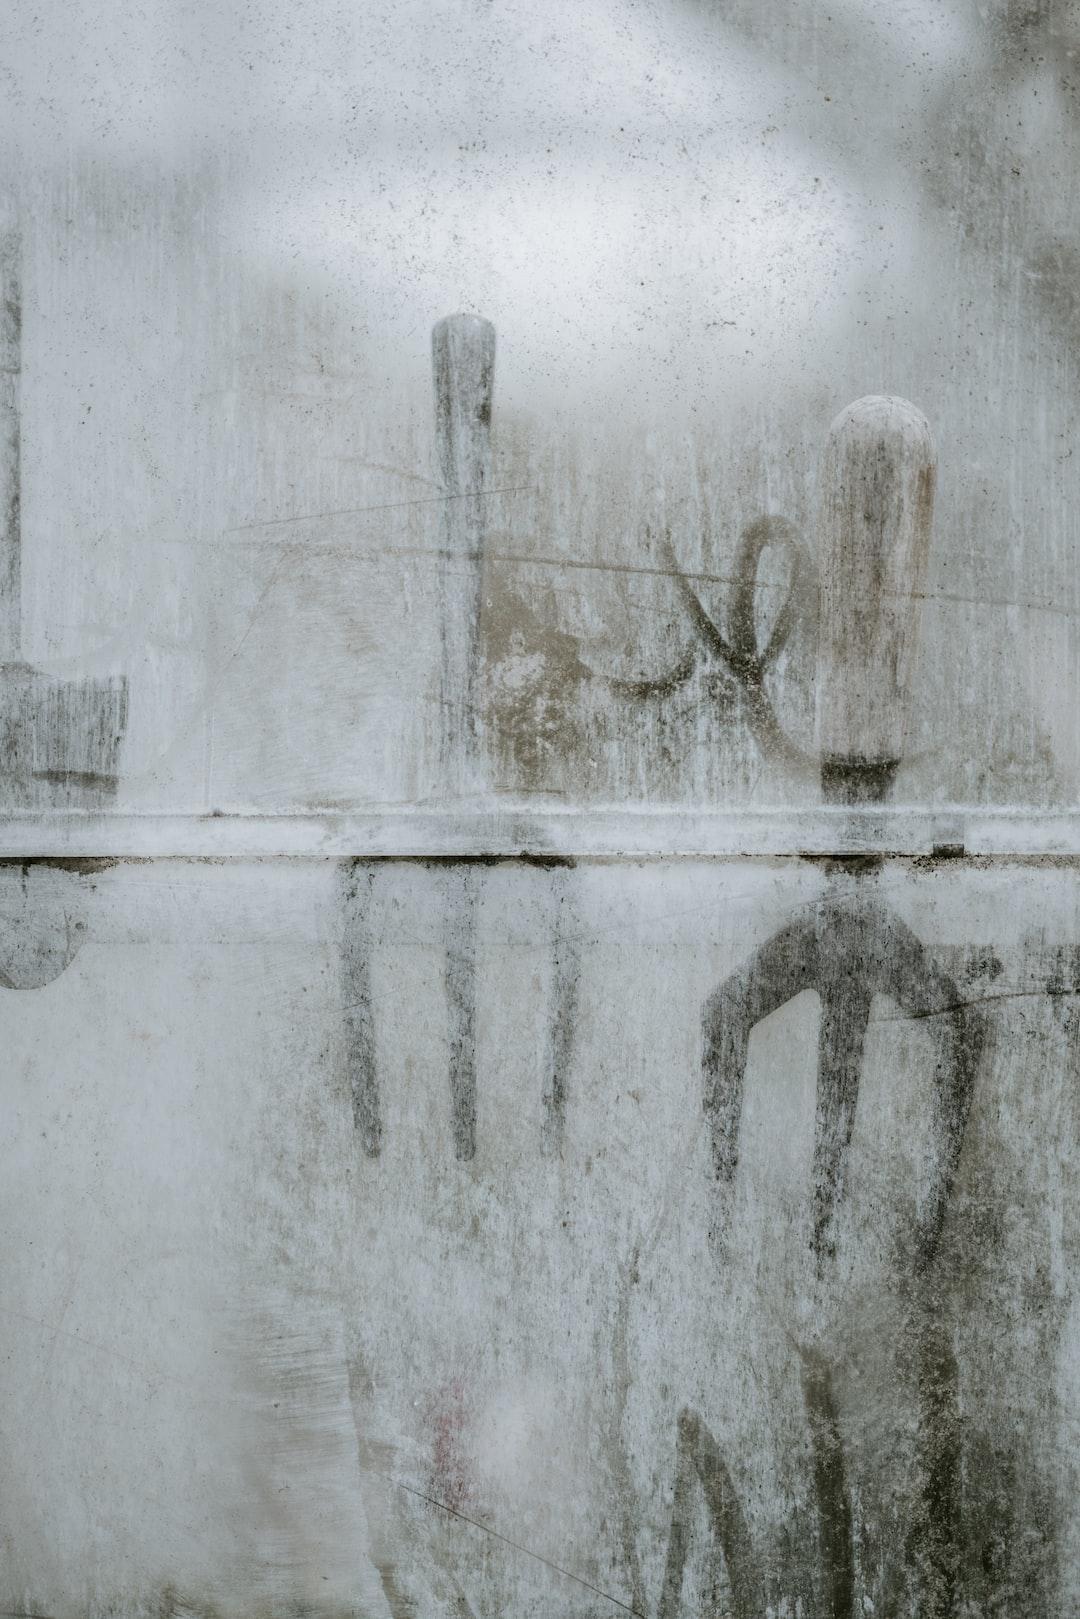 Through the greenhouse pane